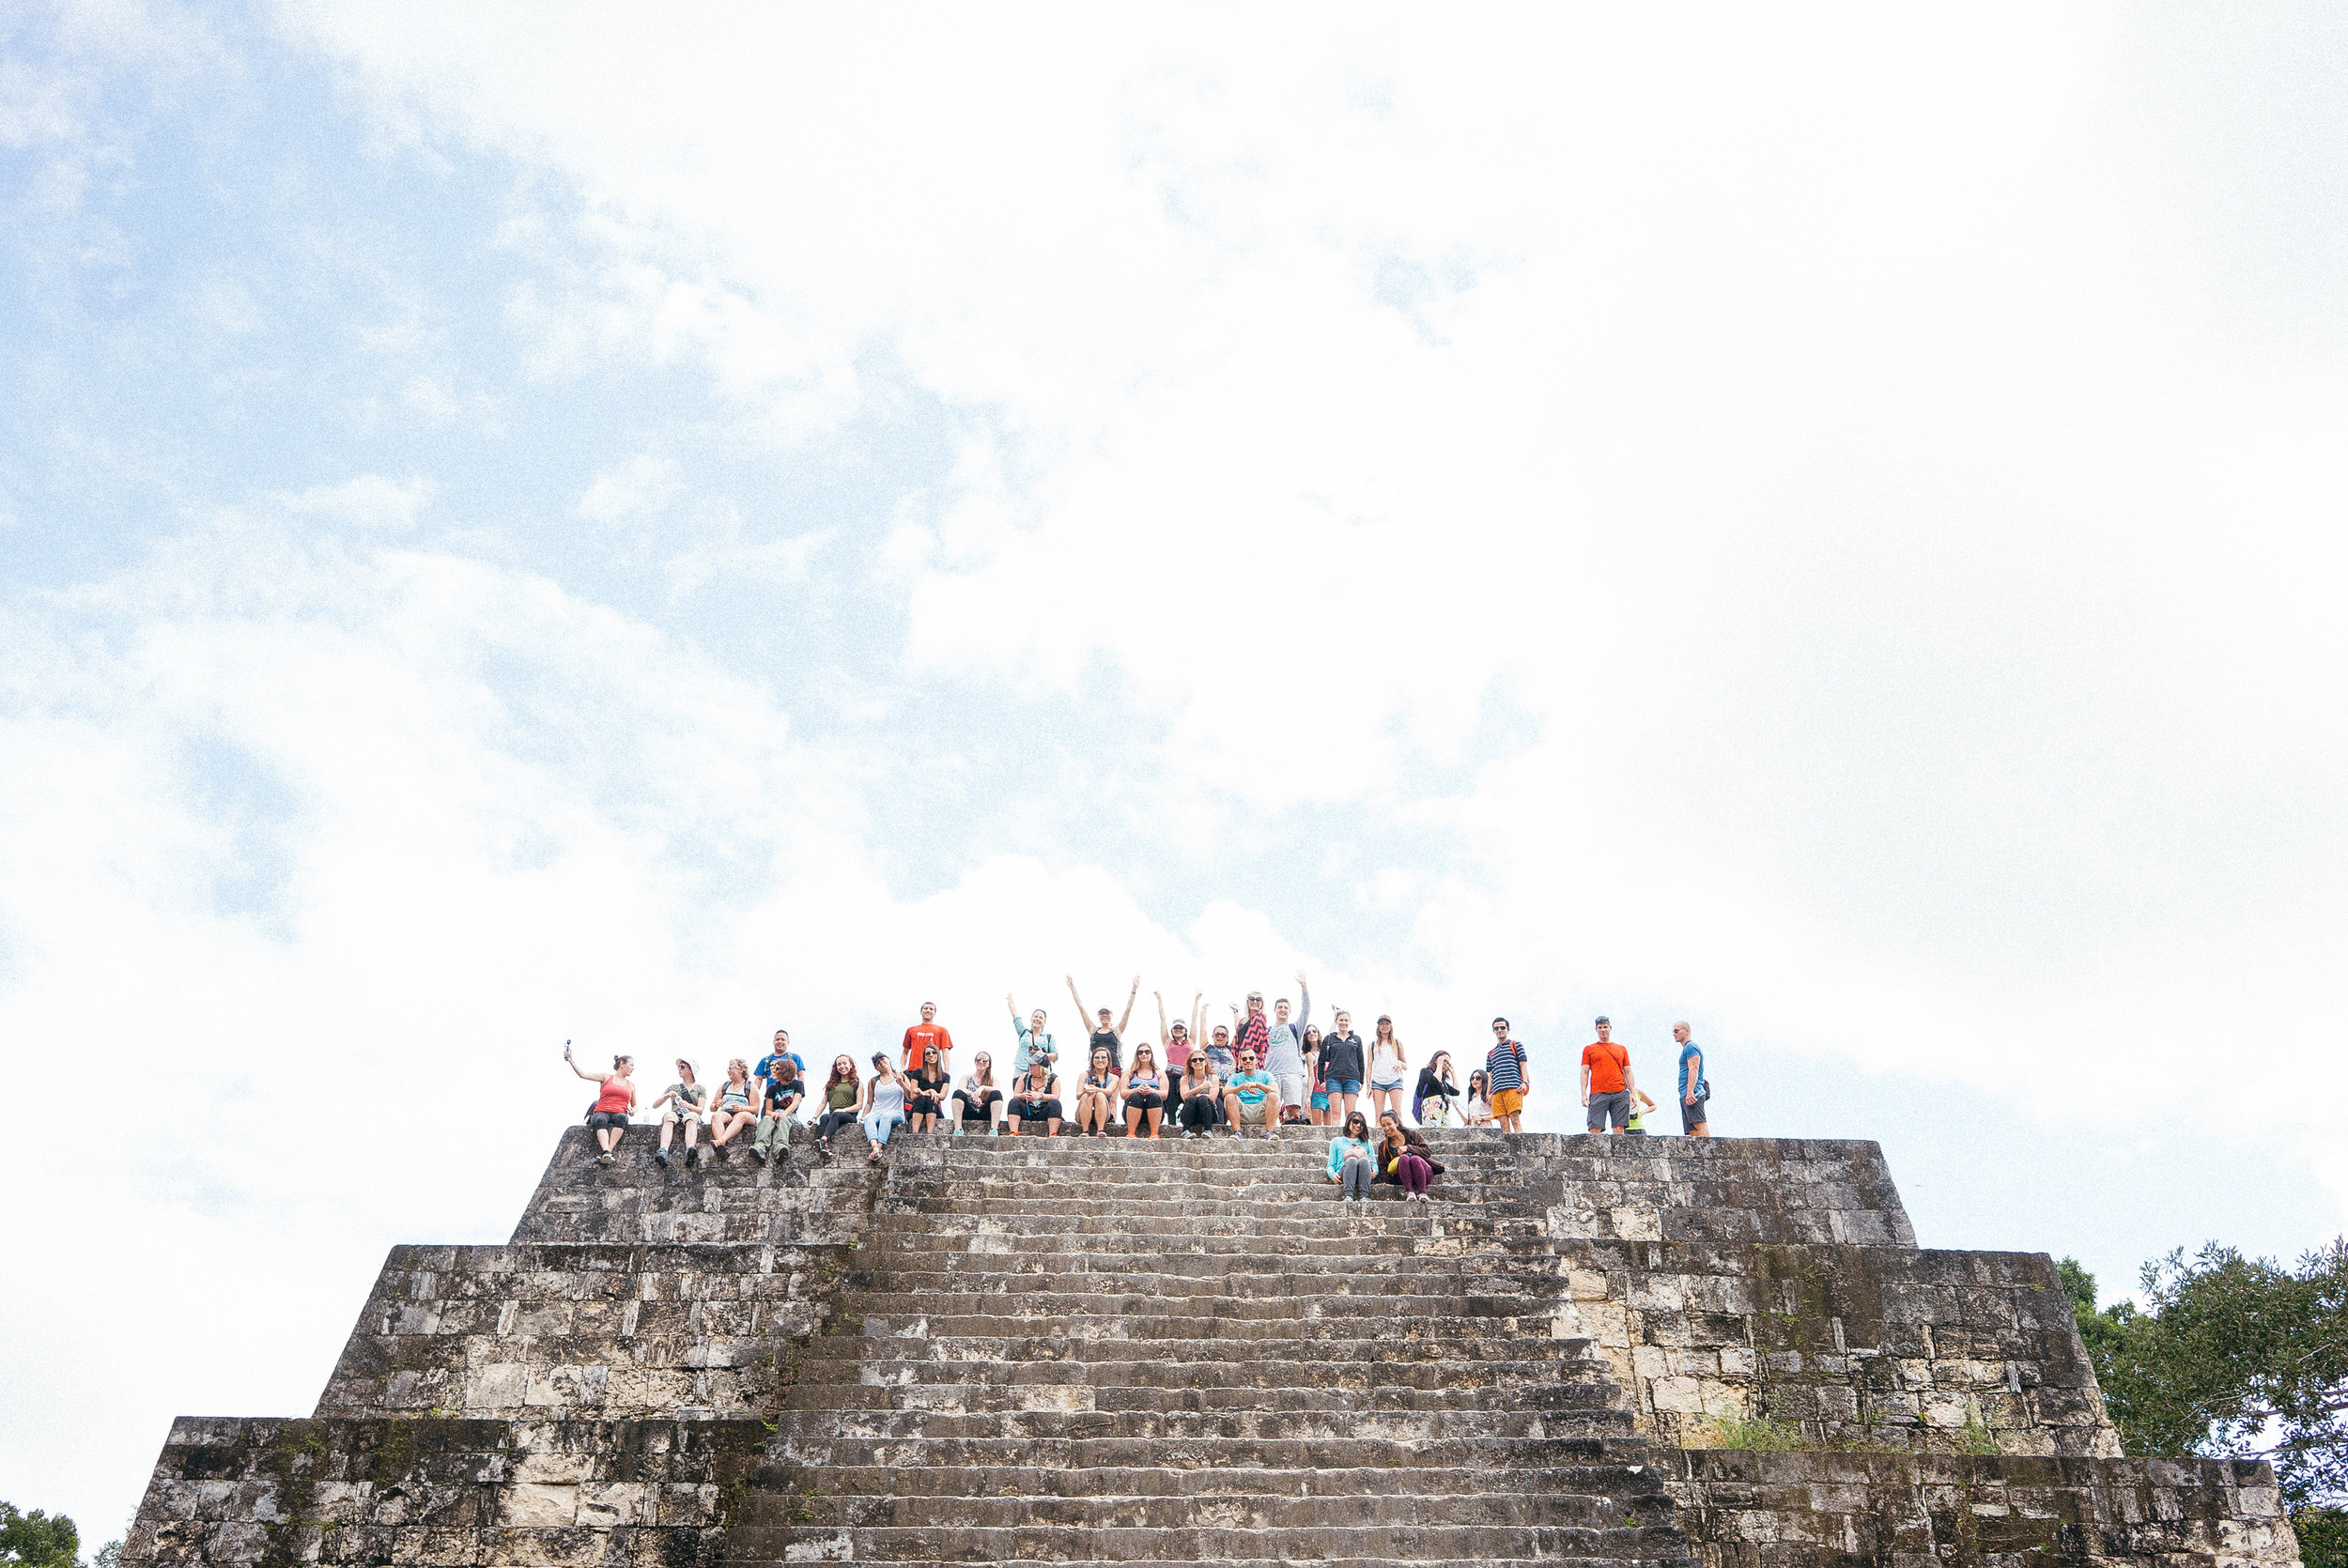 📷 by Sara Dietschy, Tikal, Guatemala